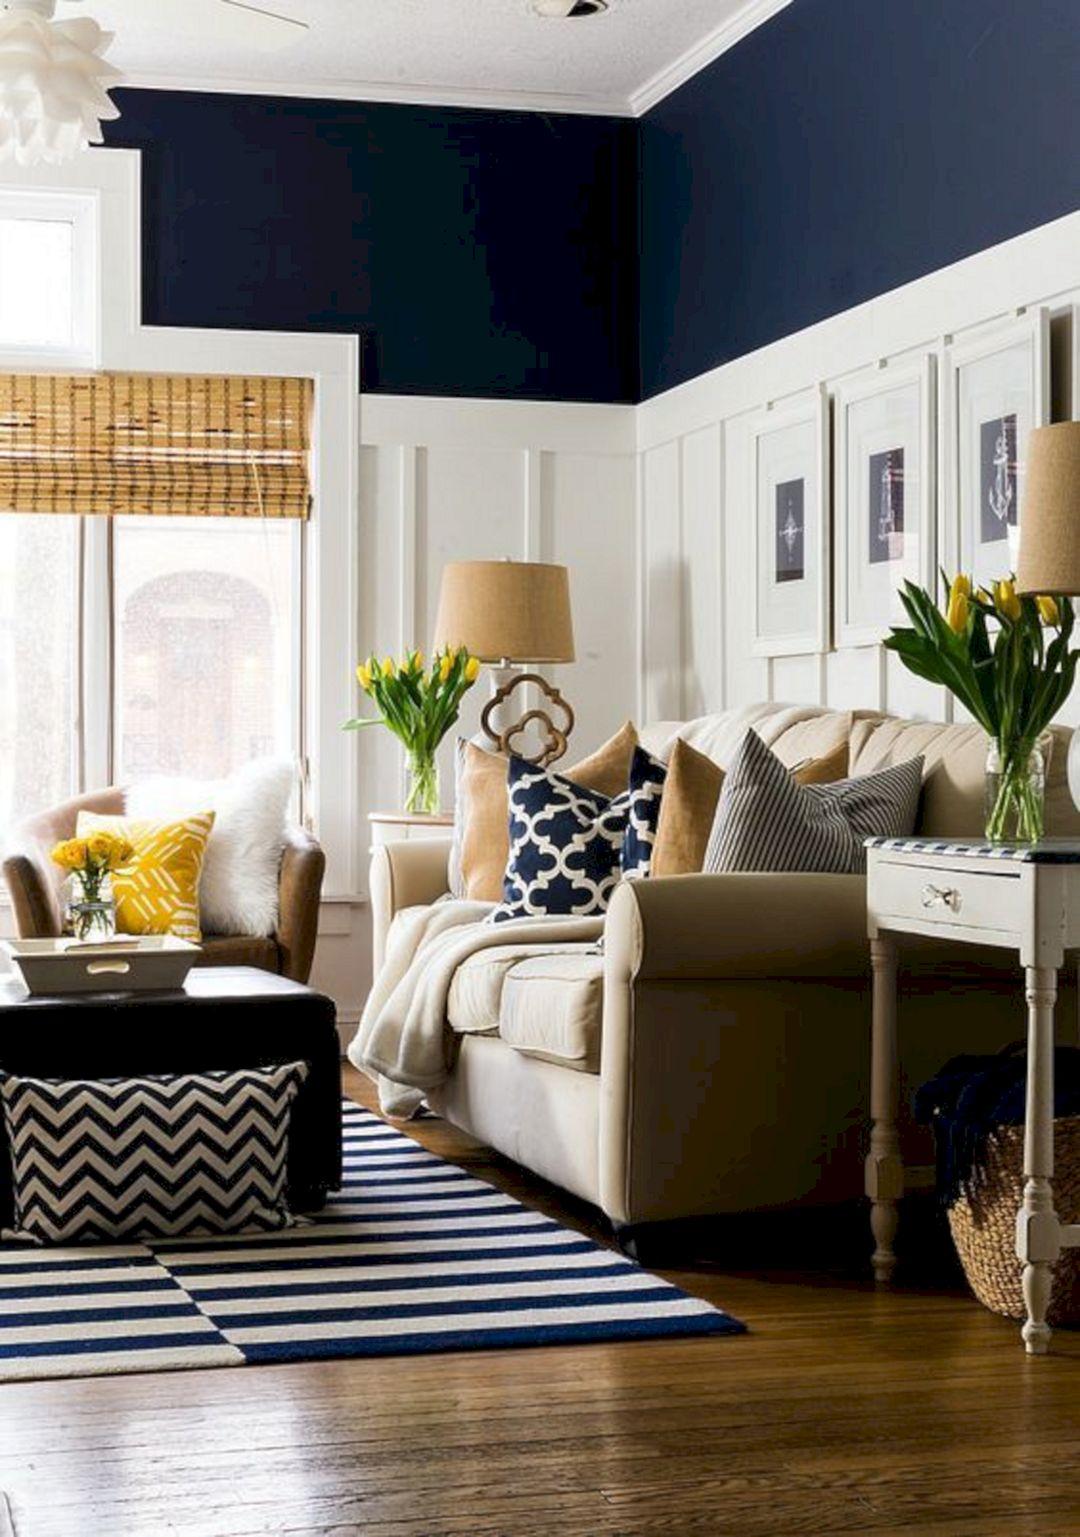 Incredible Yellow Aesthetic Bedroom Decorating Ideas 46 Decoredo